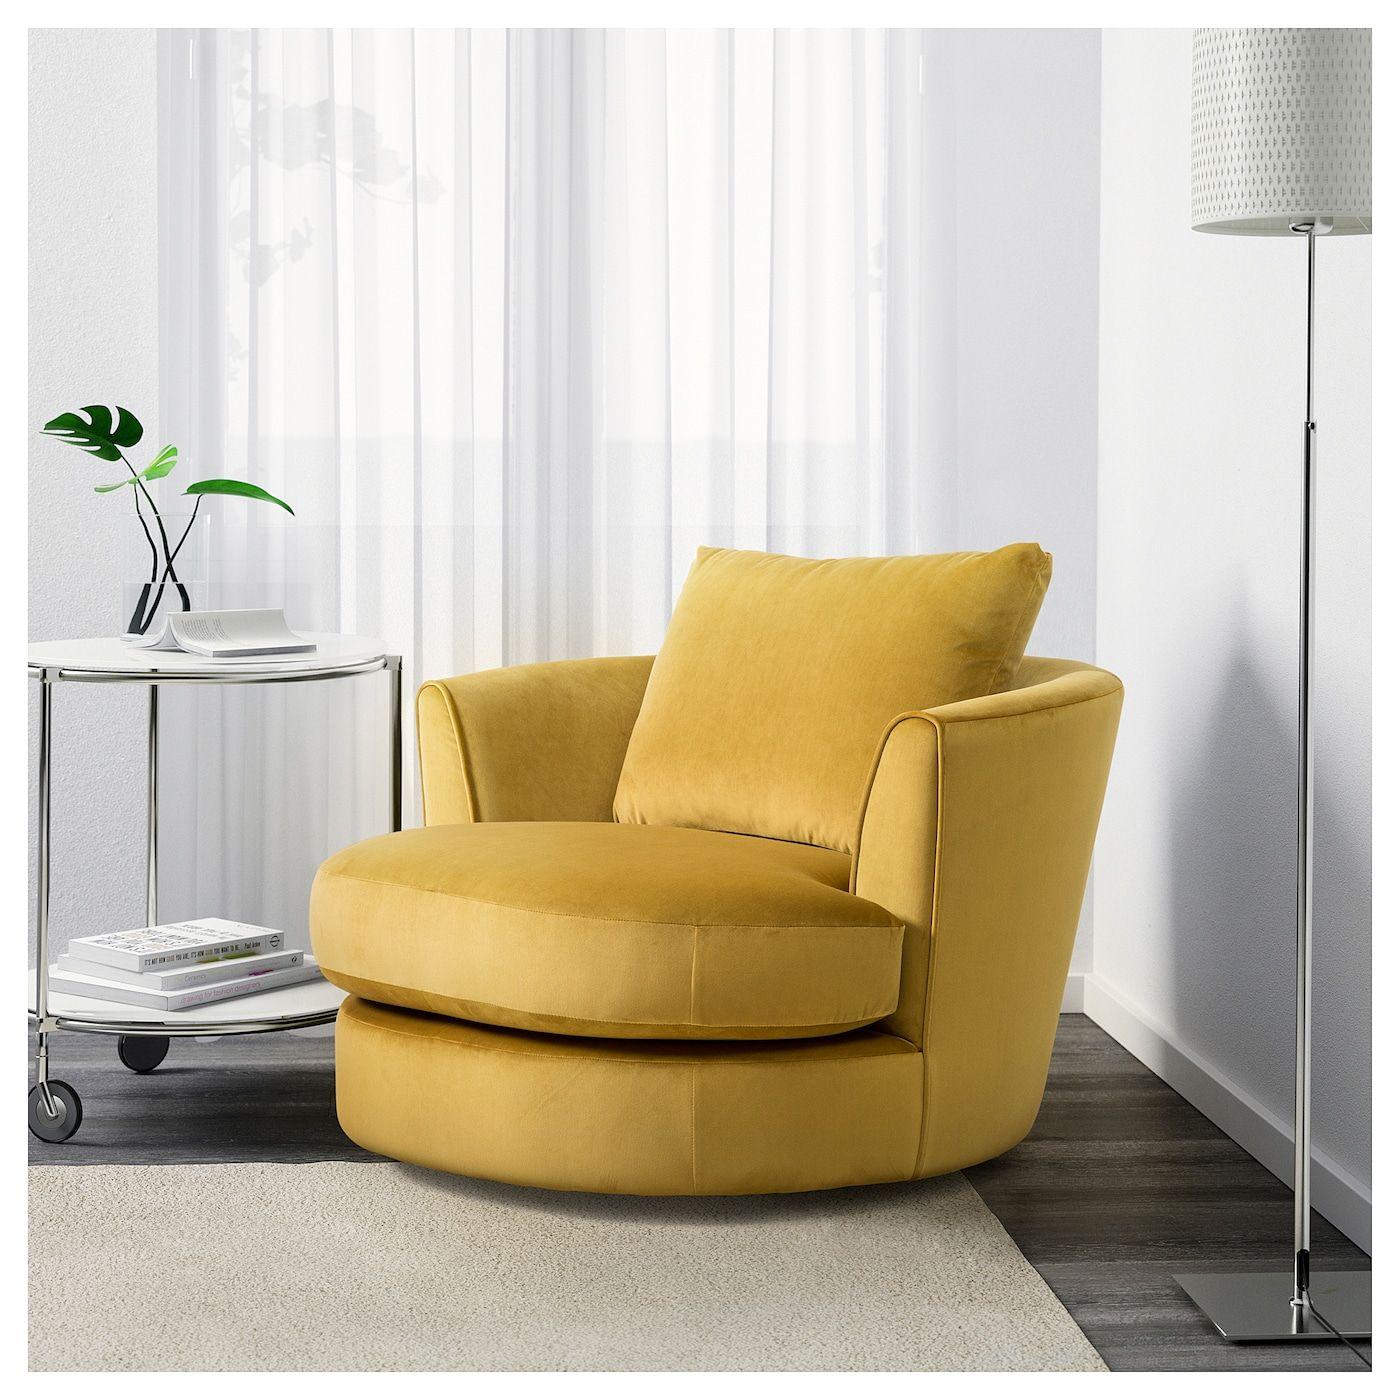 Fasalt Velvet Yellow Swivel Armchair Ikea Armchairs Living Room Modern Yellow Decor Living Room Ikea Armchair